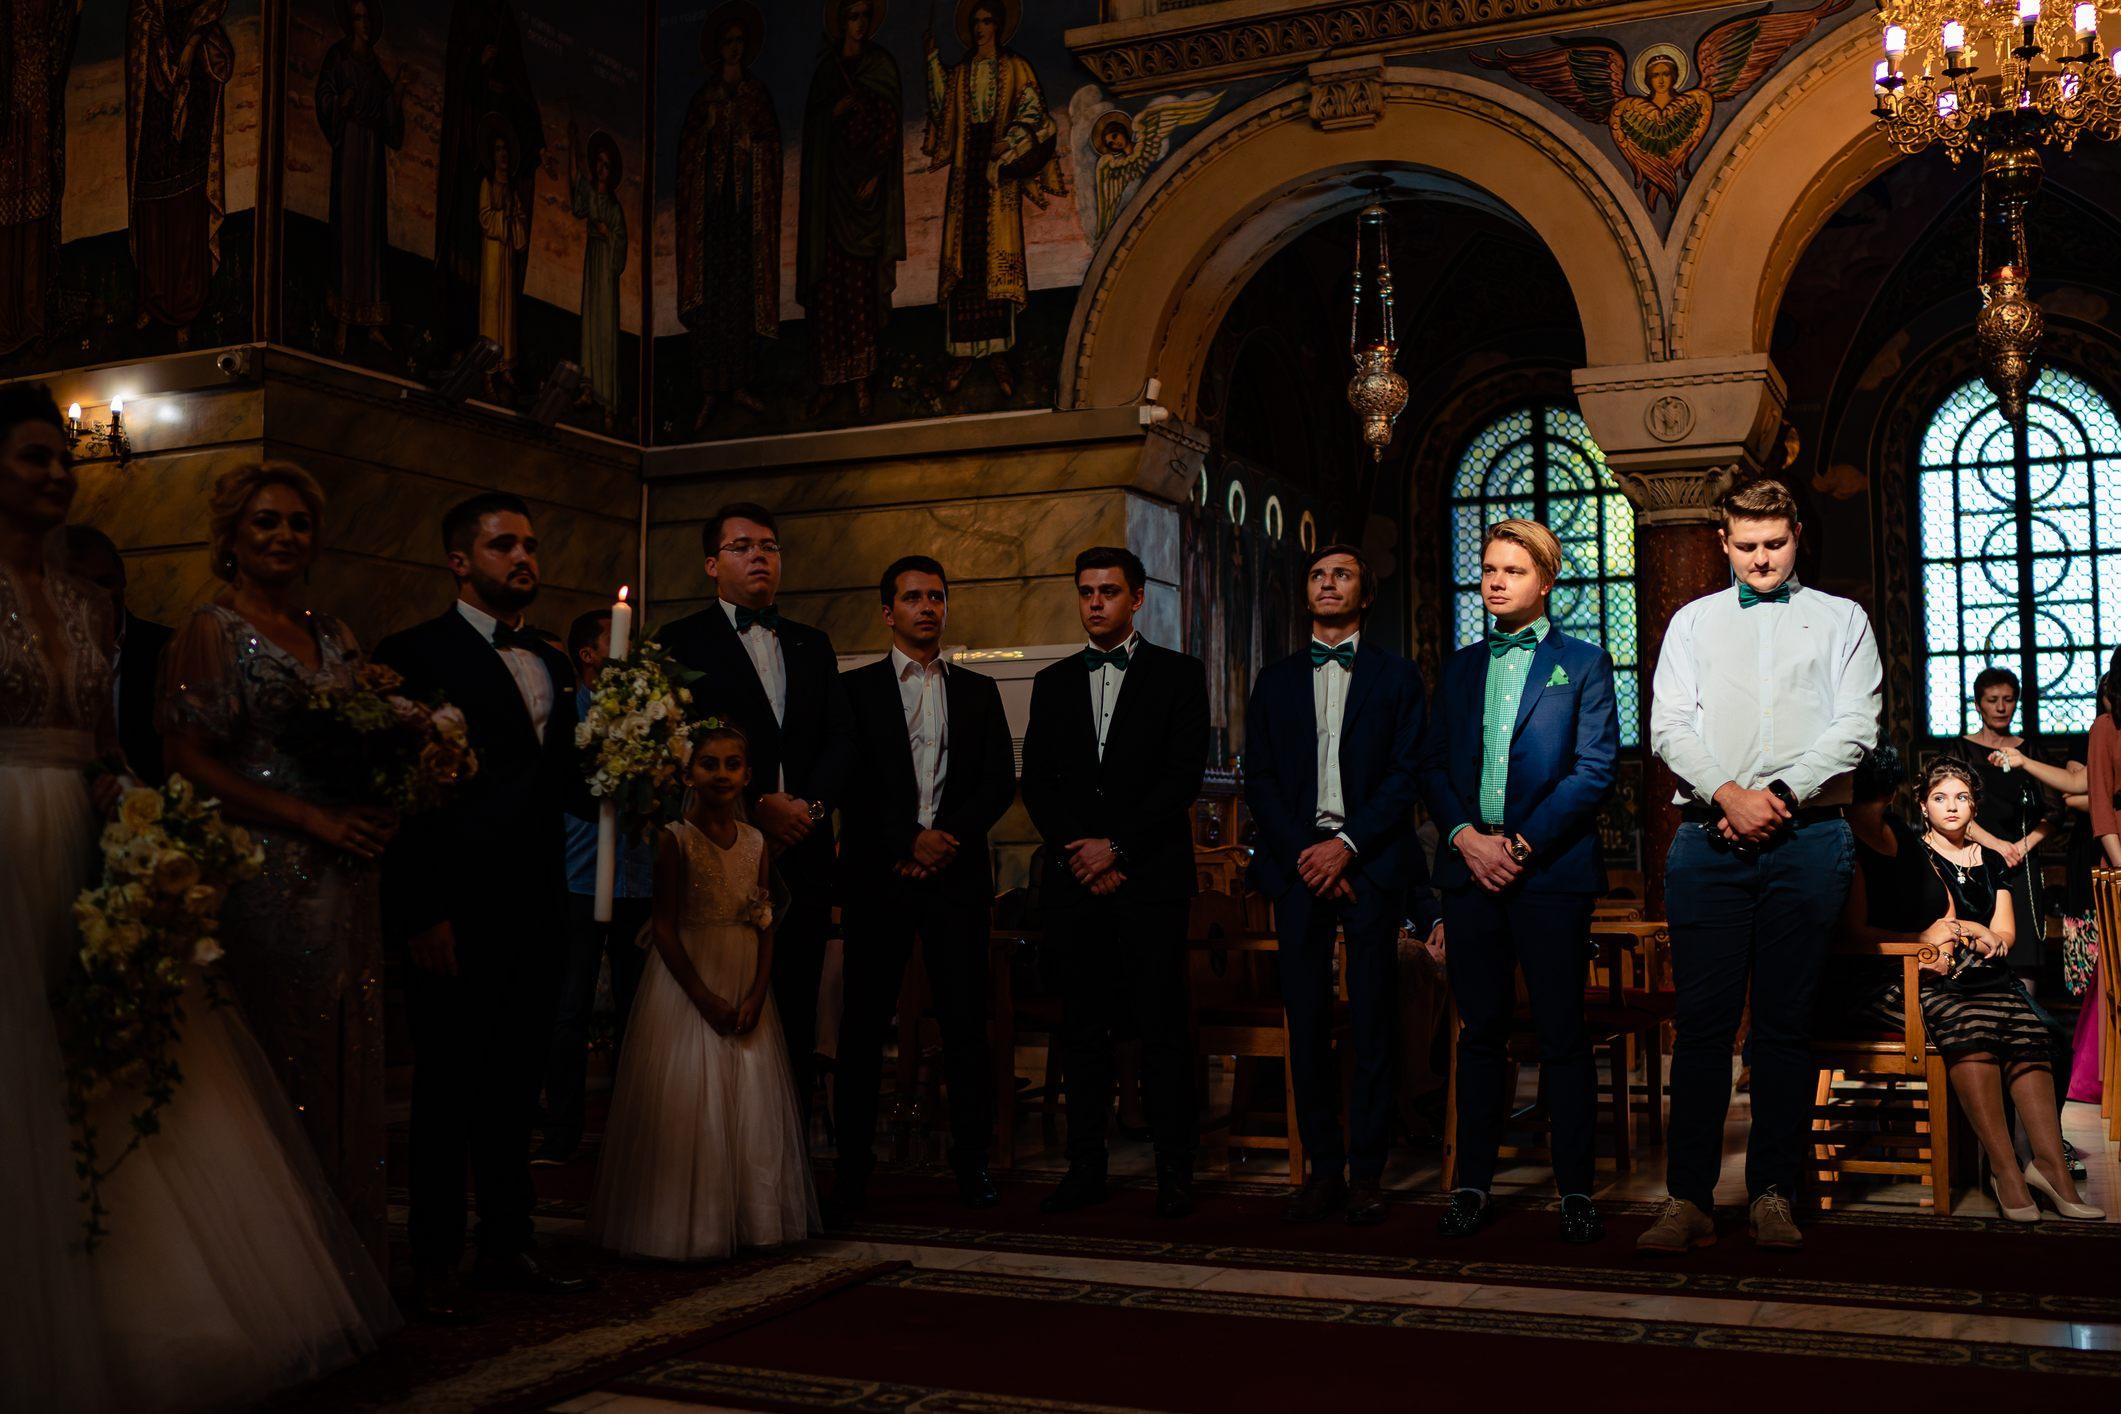 fotograf nunta bucuresti laurentiu nica  10 - Lorena & Matei | Fotografii nunta Bucuresti | Restaurant Domeniul cu Ciresi